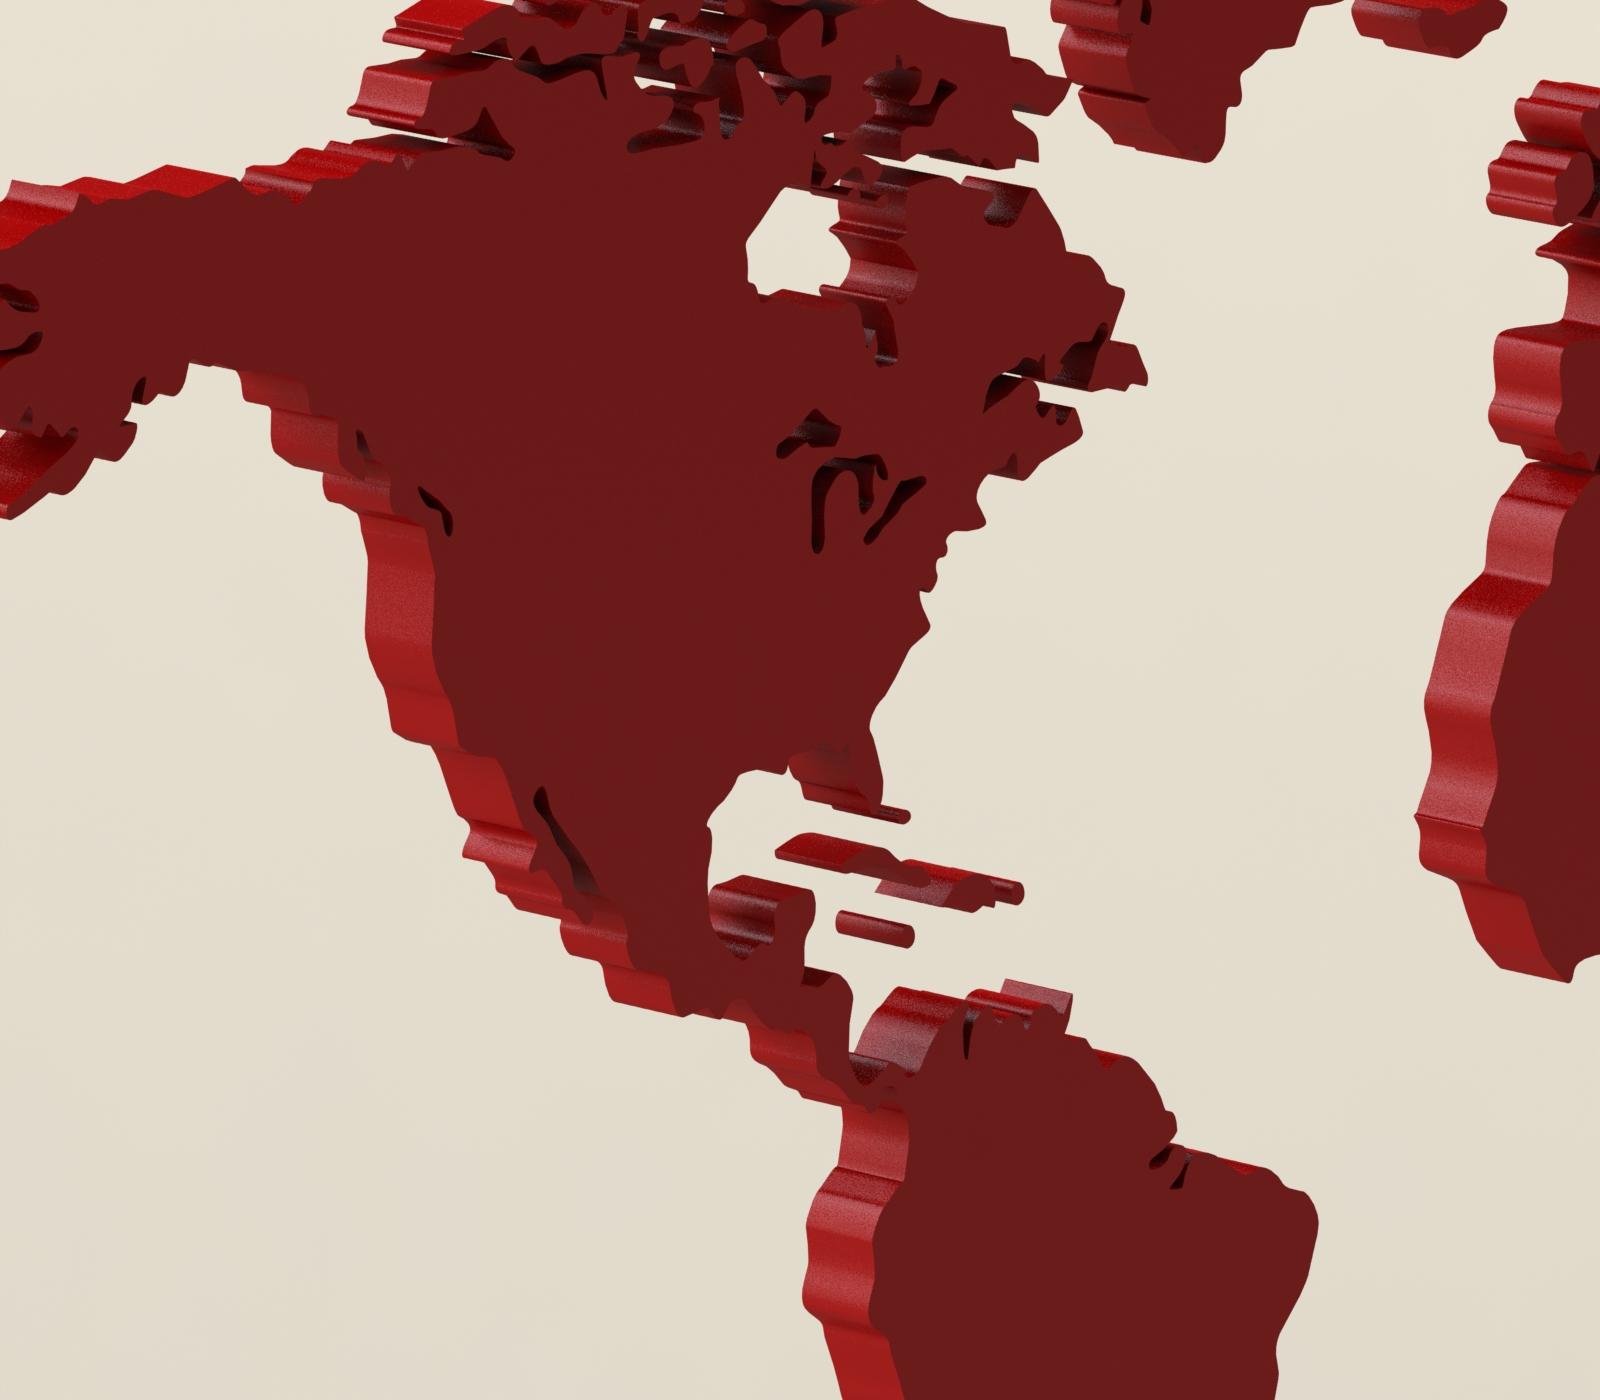 4.JPG Download free STL file World map • 3D print template, osayomipeters